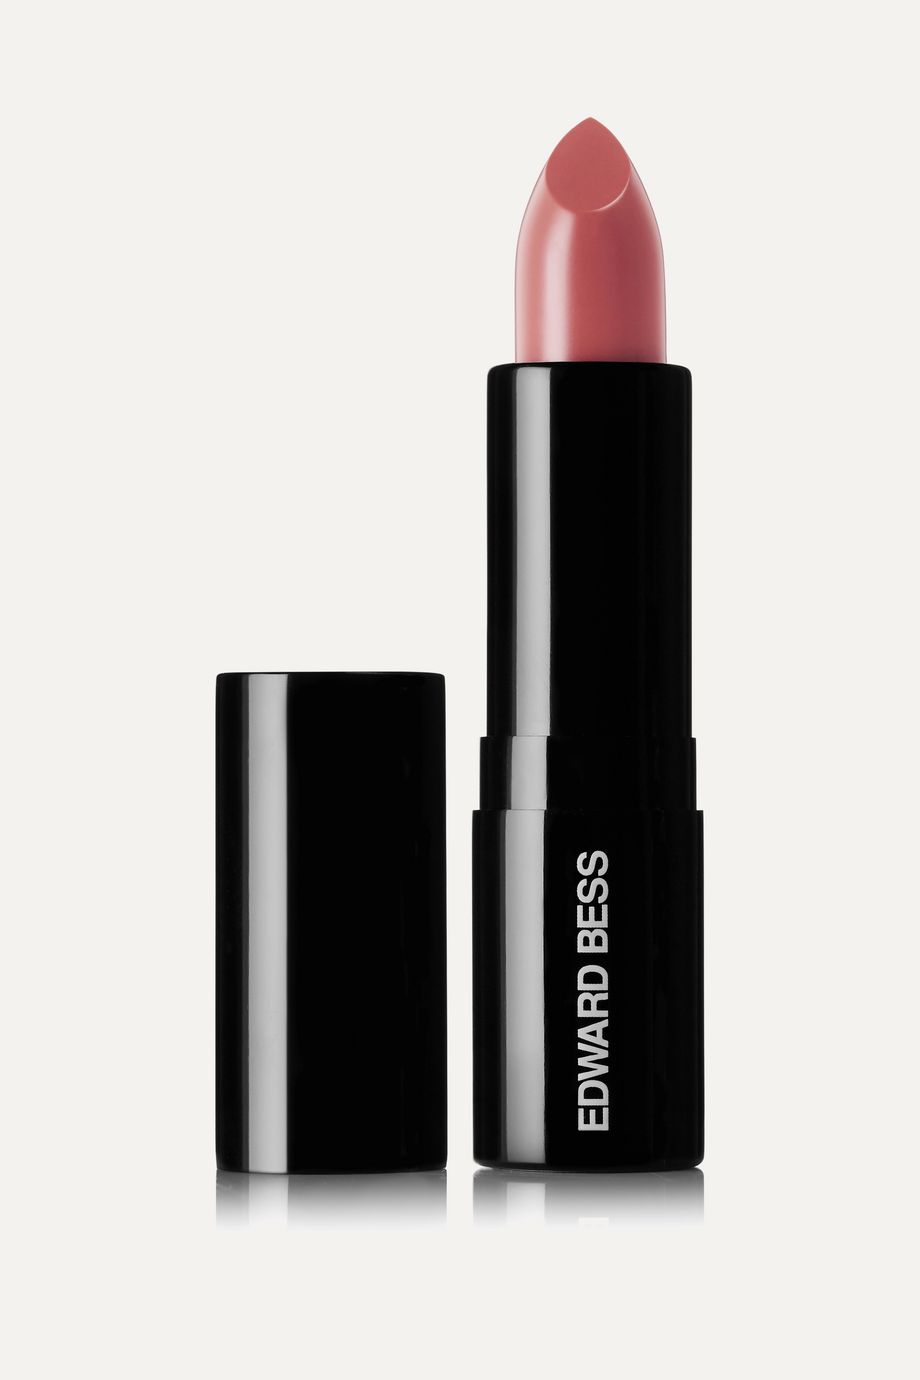 Edward Bess Ultra Slick Lipstick - Secret Seduction